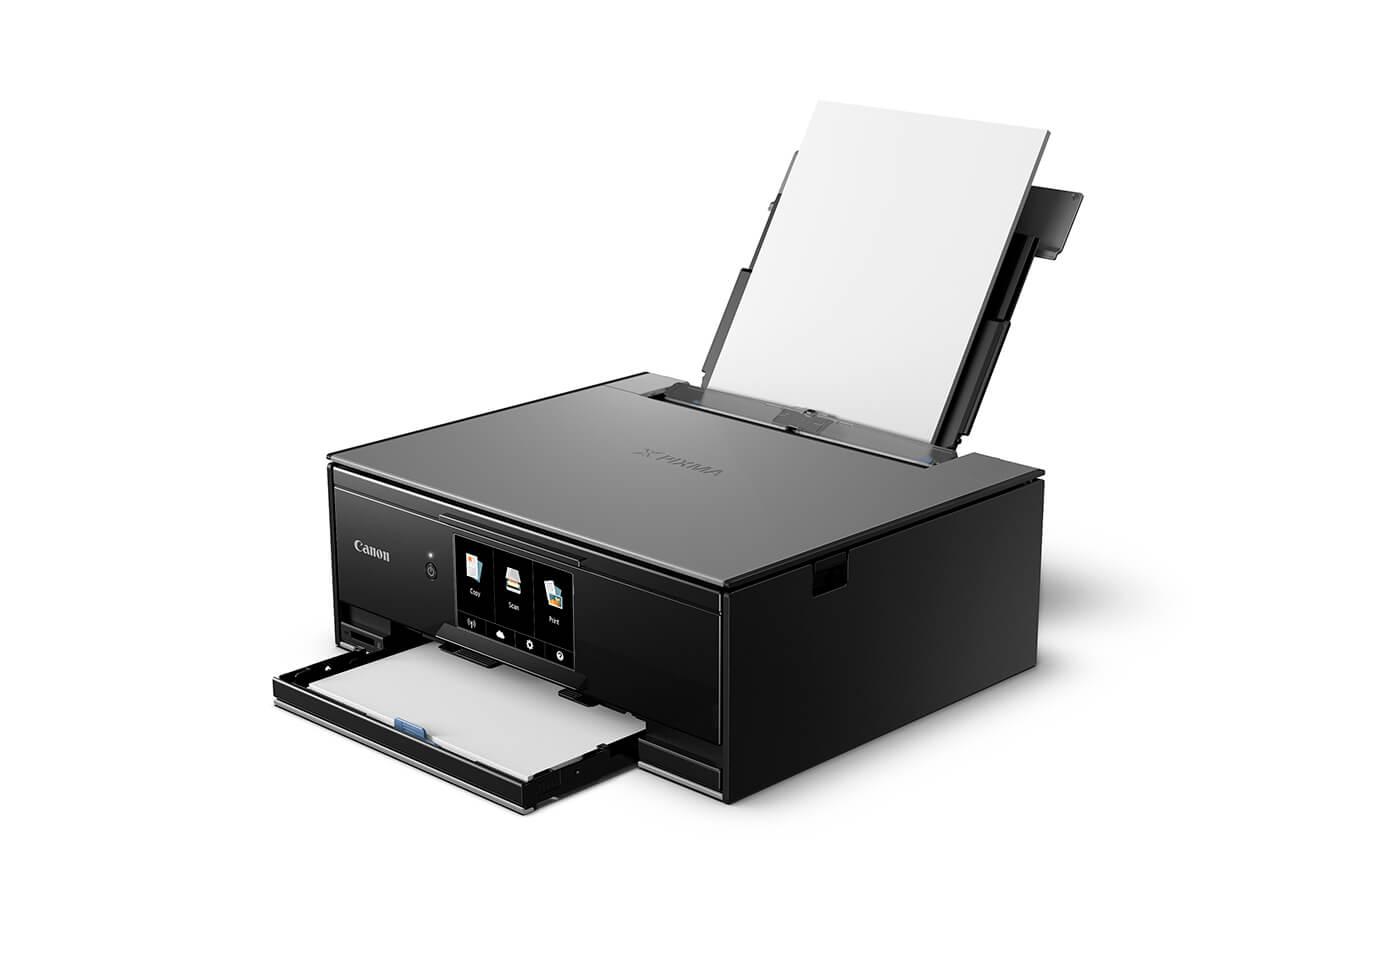 TS9160 dual paper